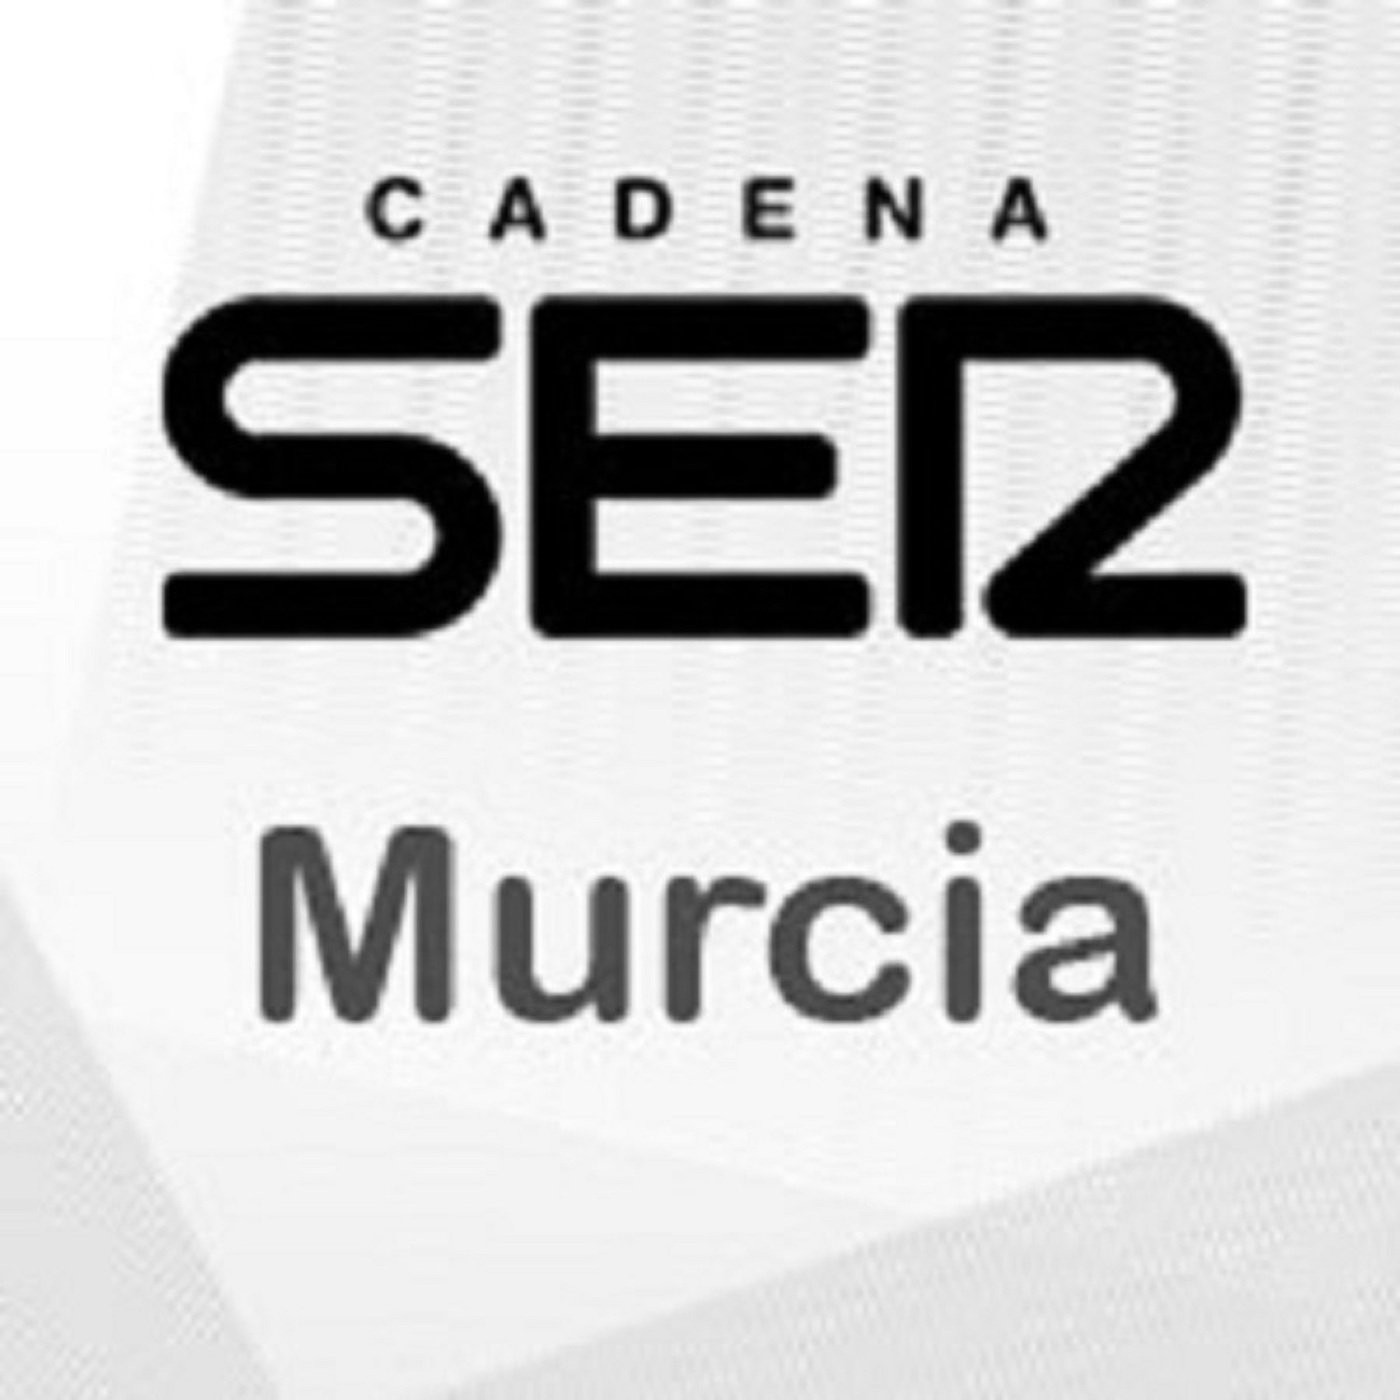 <![CDATA[Radio Murcia - Cadena SER]]>